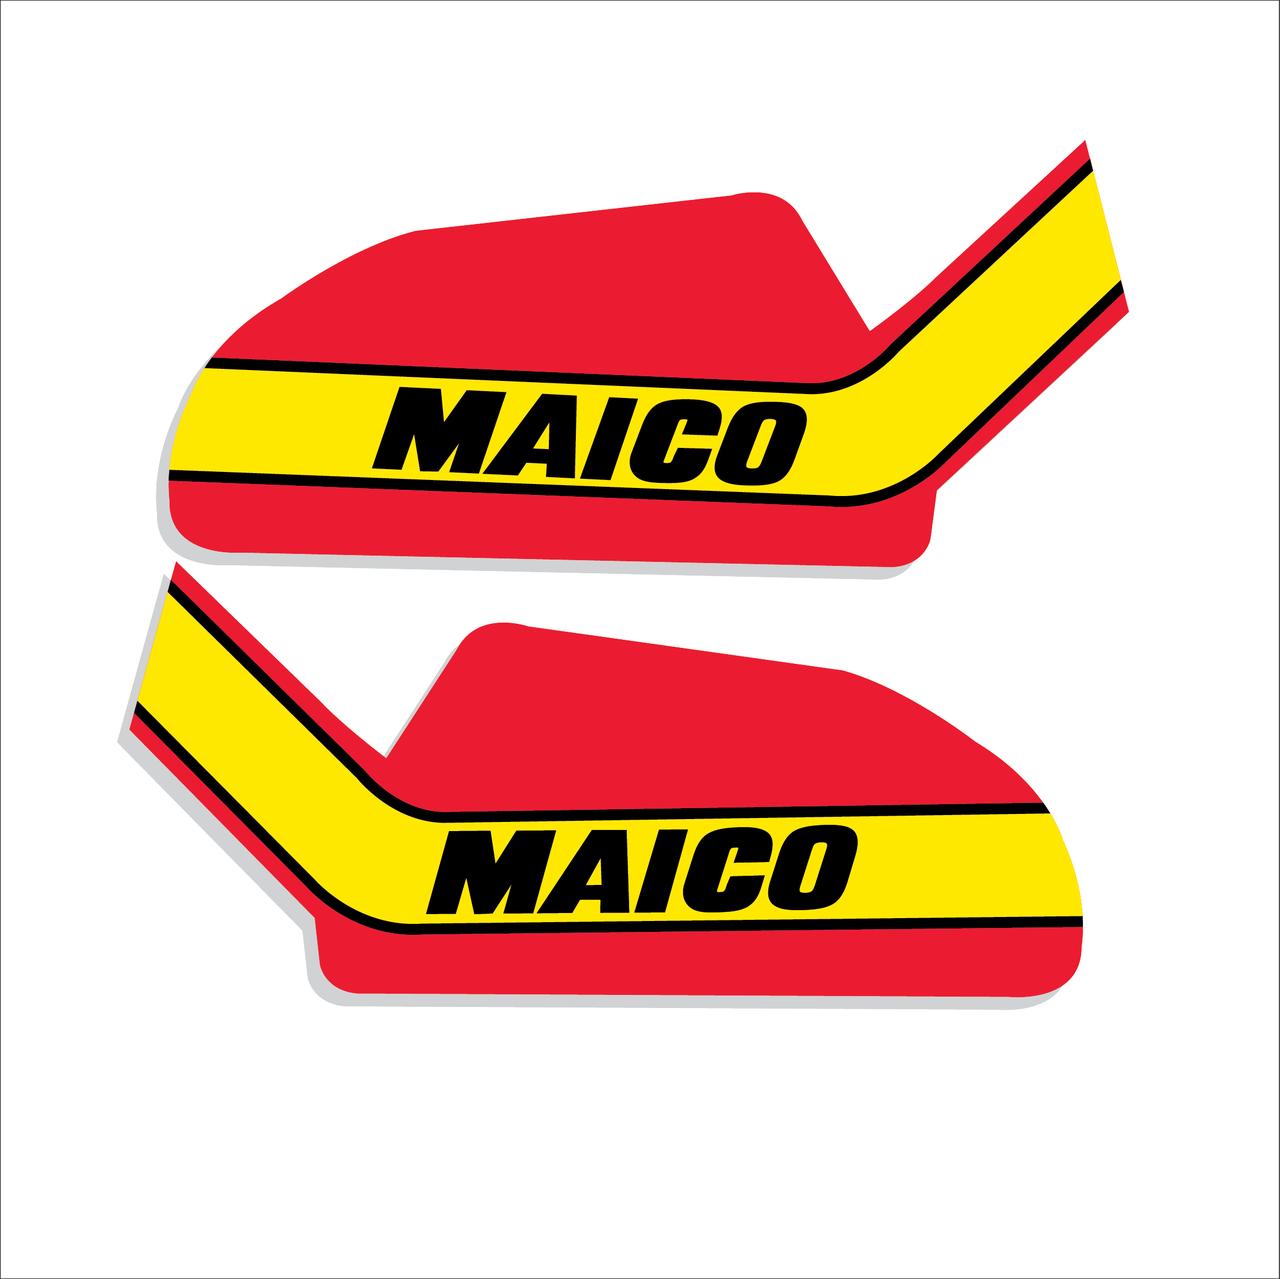 79 MAICO Tank Decals